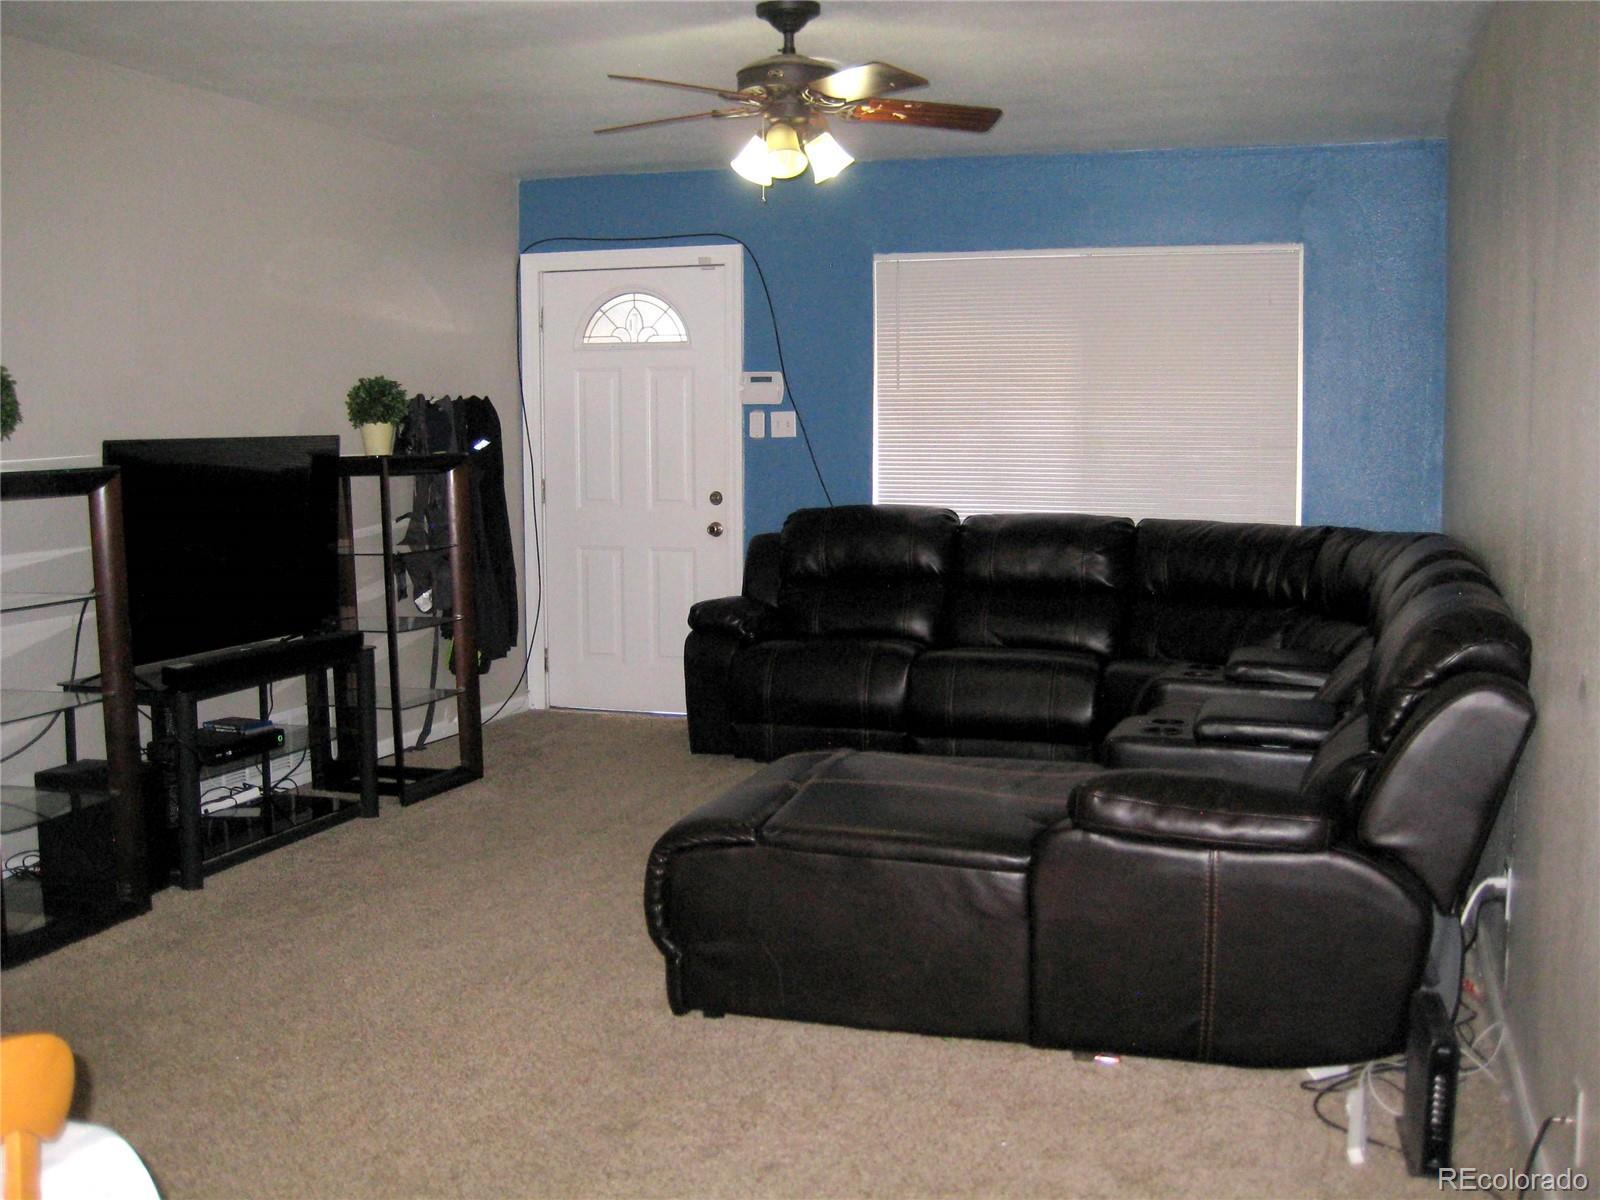 MLS# 8530466 - 2 - 957 Revere Street, Aurora, CO 80011